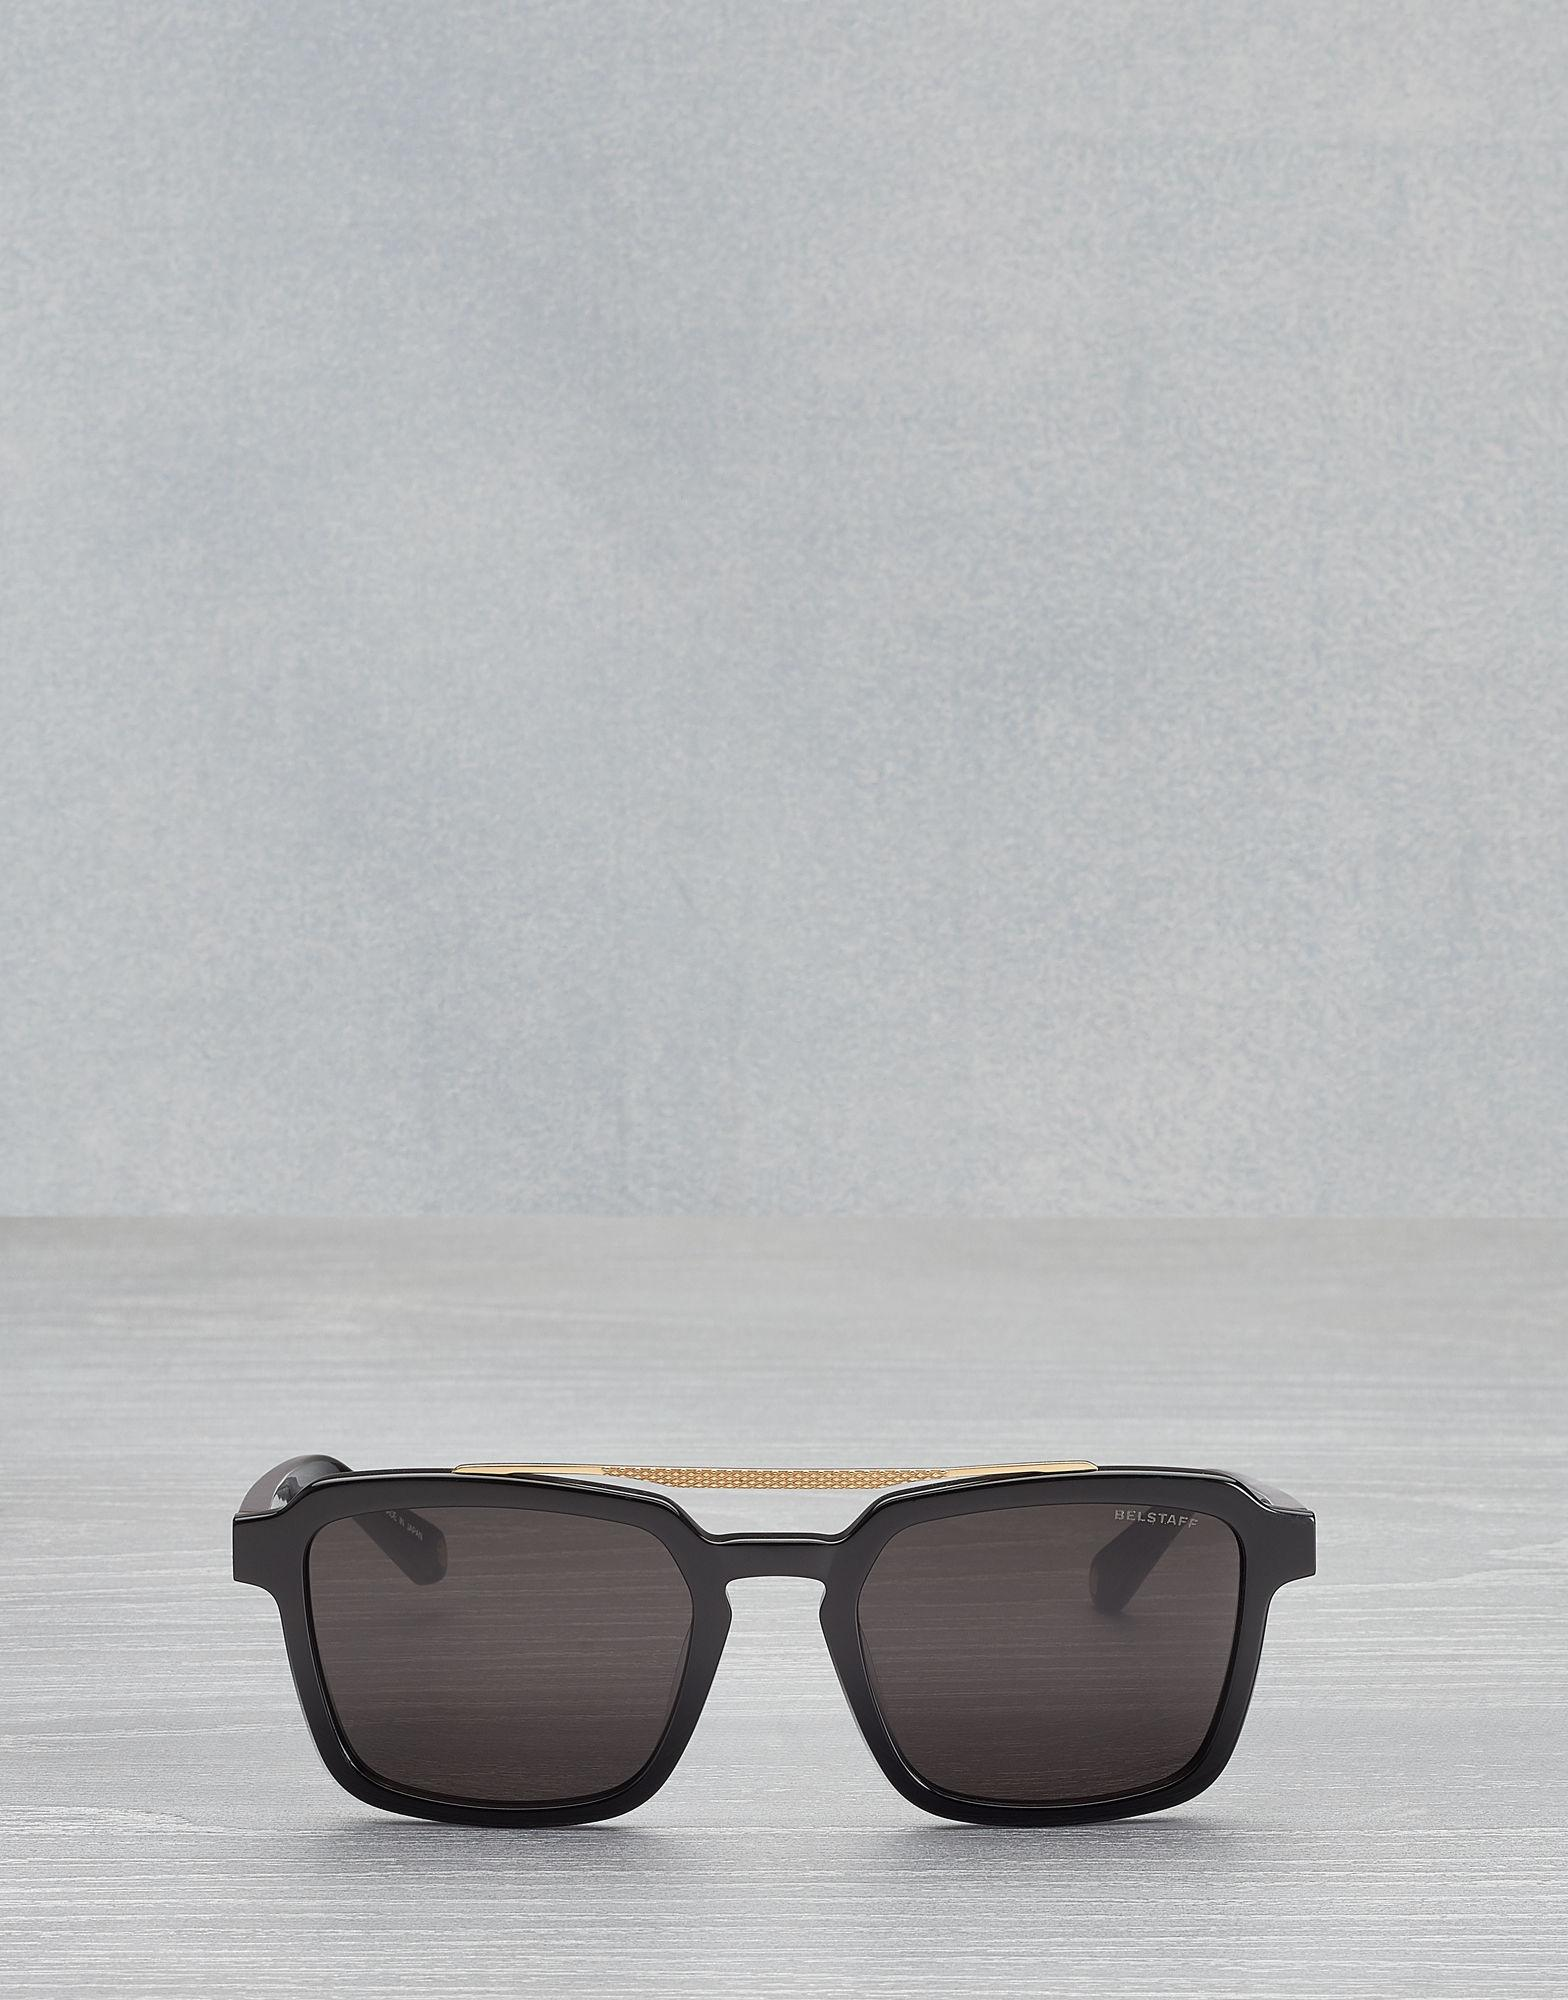 f9095c43cd41 Belstaff Cassel Sunglasses for Men - Lyst